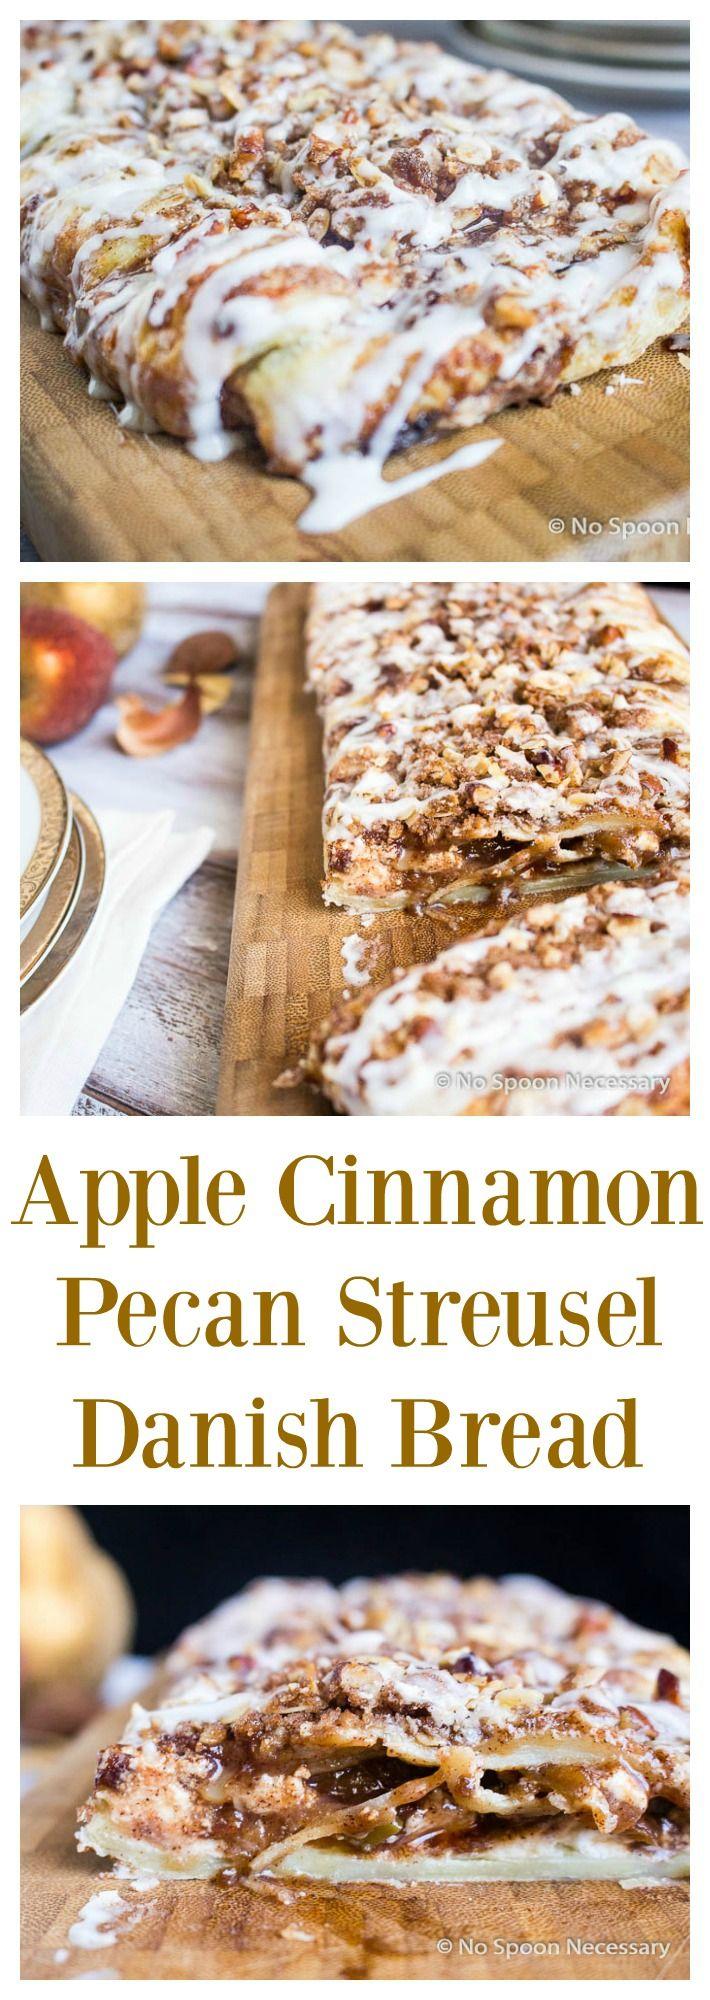 Apple Cinnamon Pecan Cream Cheese Danish Bread - A Spin on Entenmann's Raspberry Danish Twist.